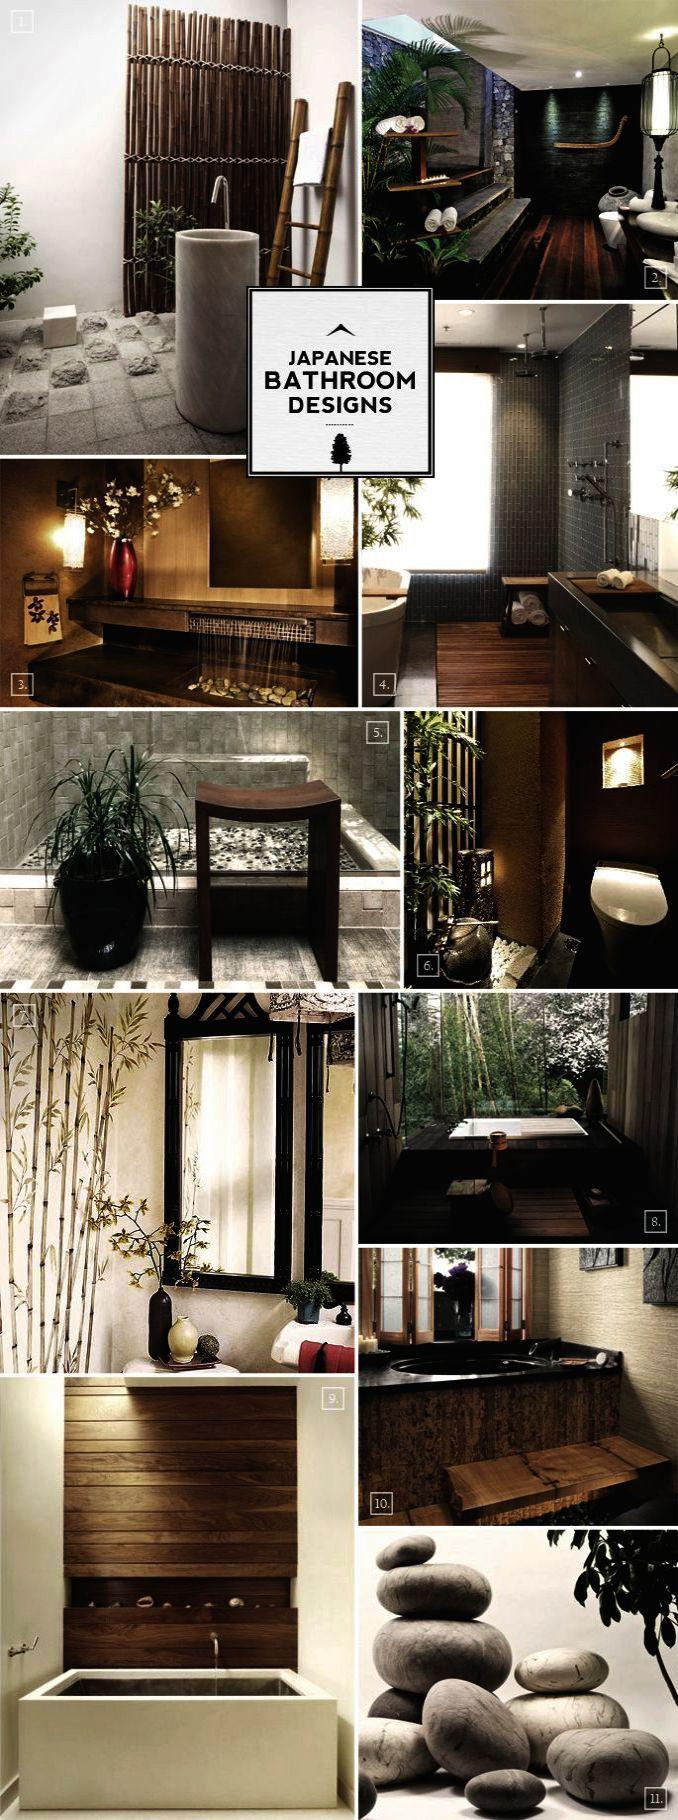 Bathroom Mirrors Dunelm Hdb Bathroom Design Ideas Japanese Bathroom Design Zen Interiors Asian Home Decor Japanese bathroom design ideas